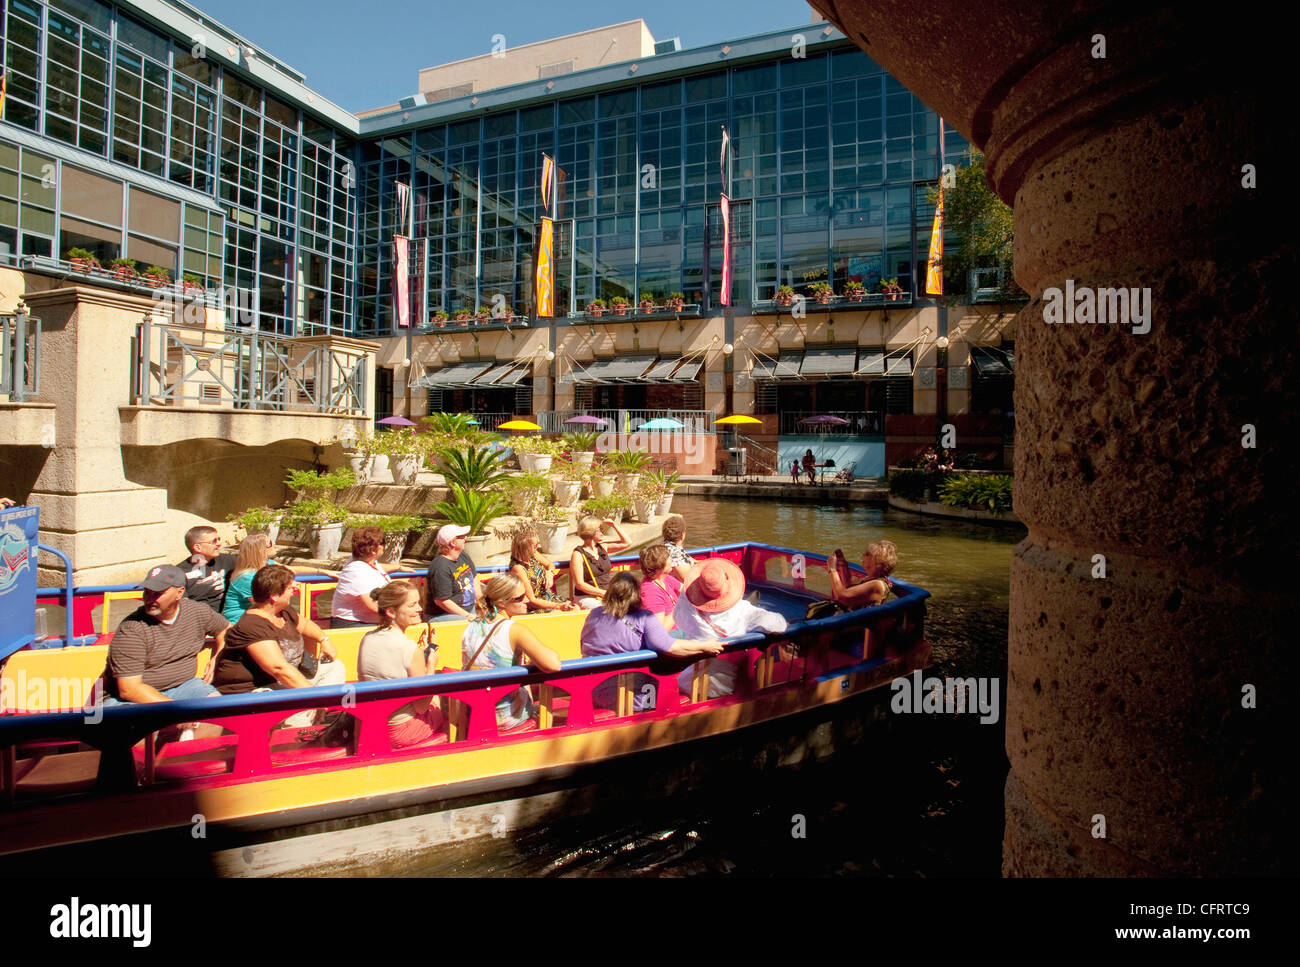 USA Texas San Antonio Riverwalk Gondola With Tourists River Center Mall PLEASE CALL FOR SUPER HI RES FILES